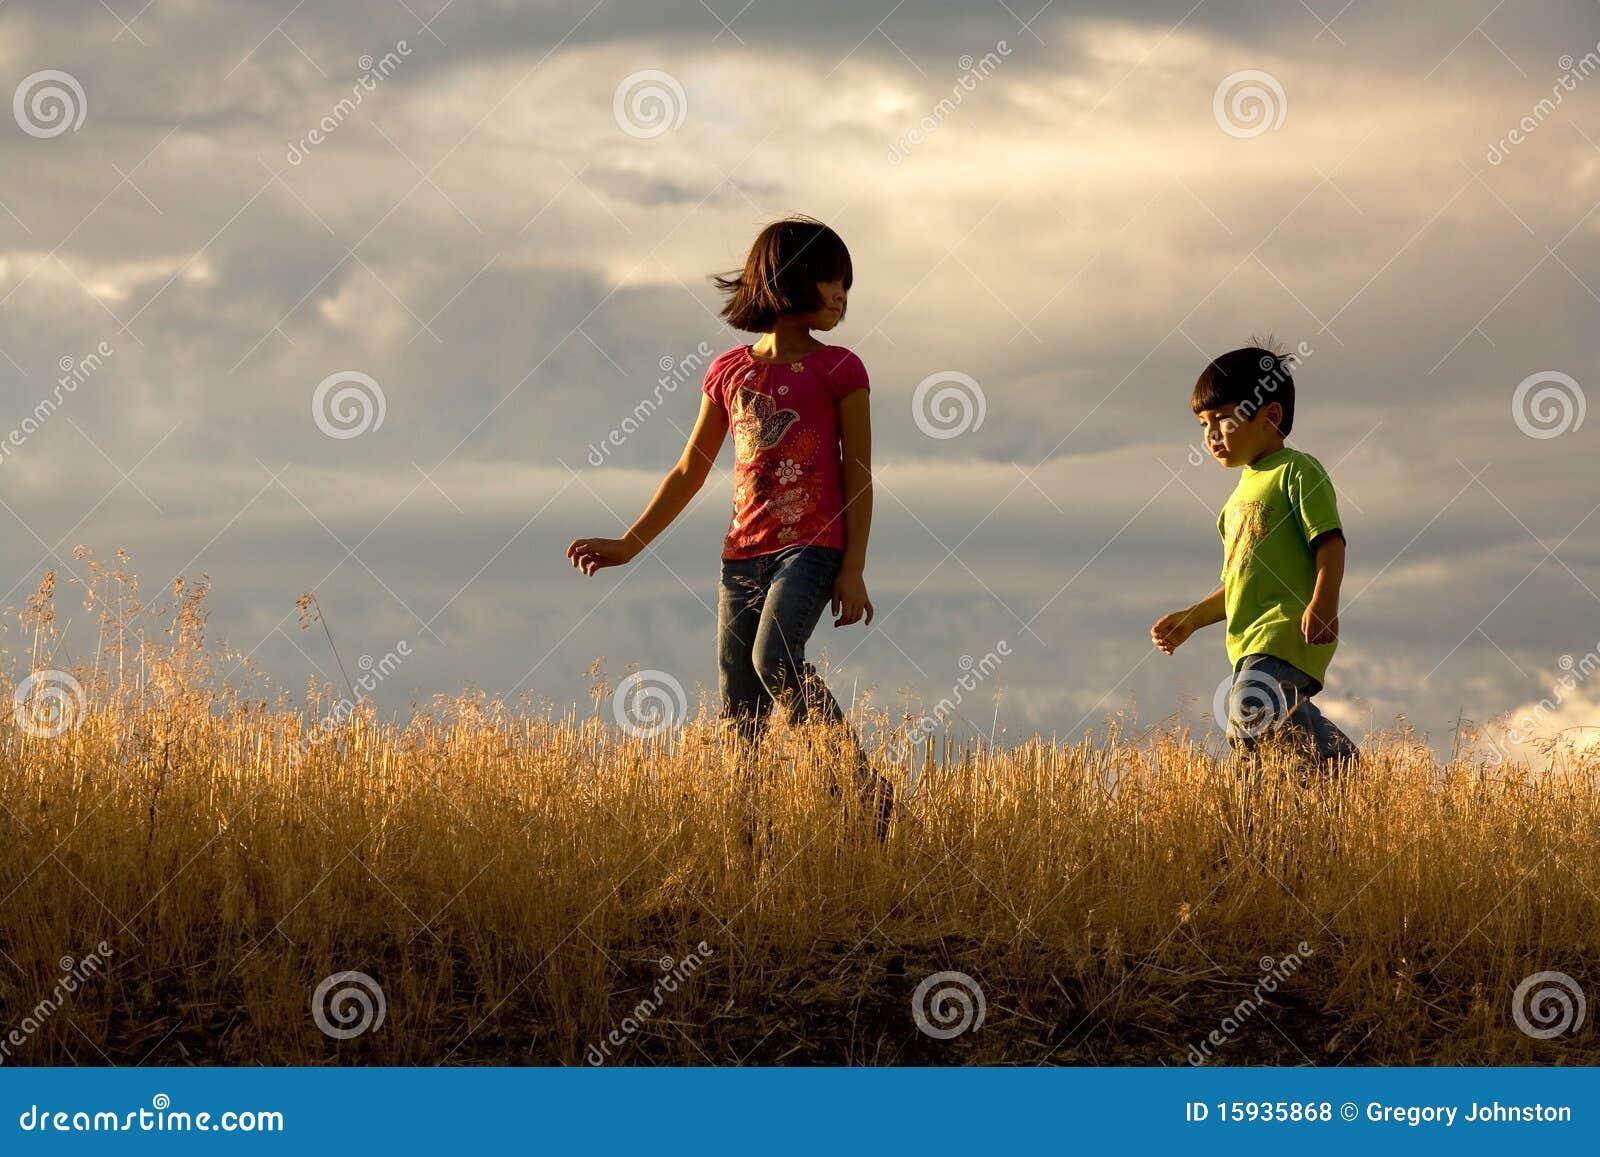 Kids Adventure. Royalty Free Stock Photos - Image: 15935868